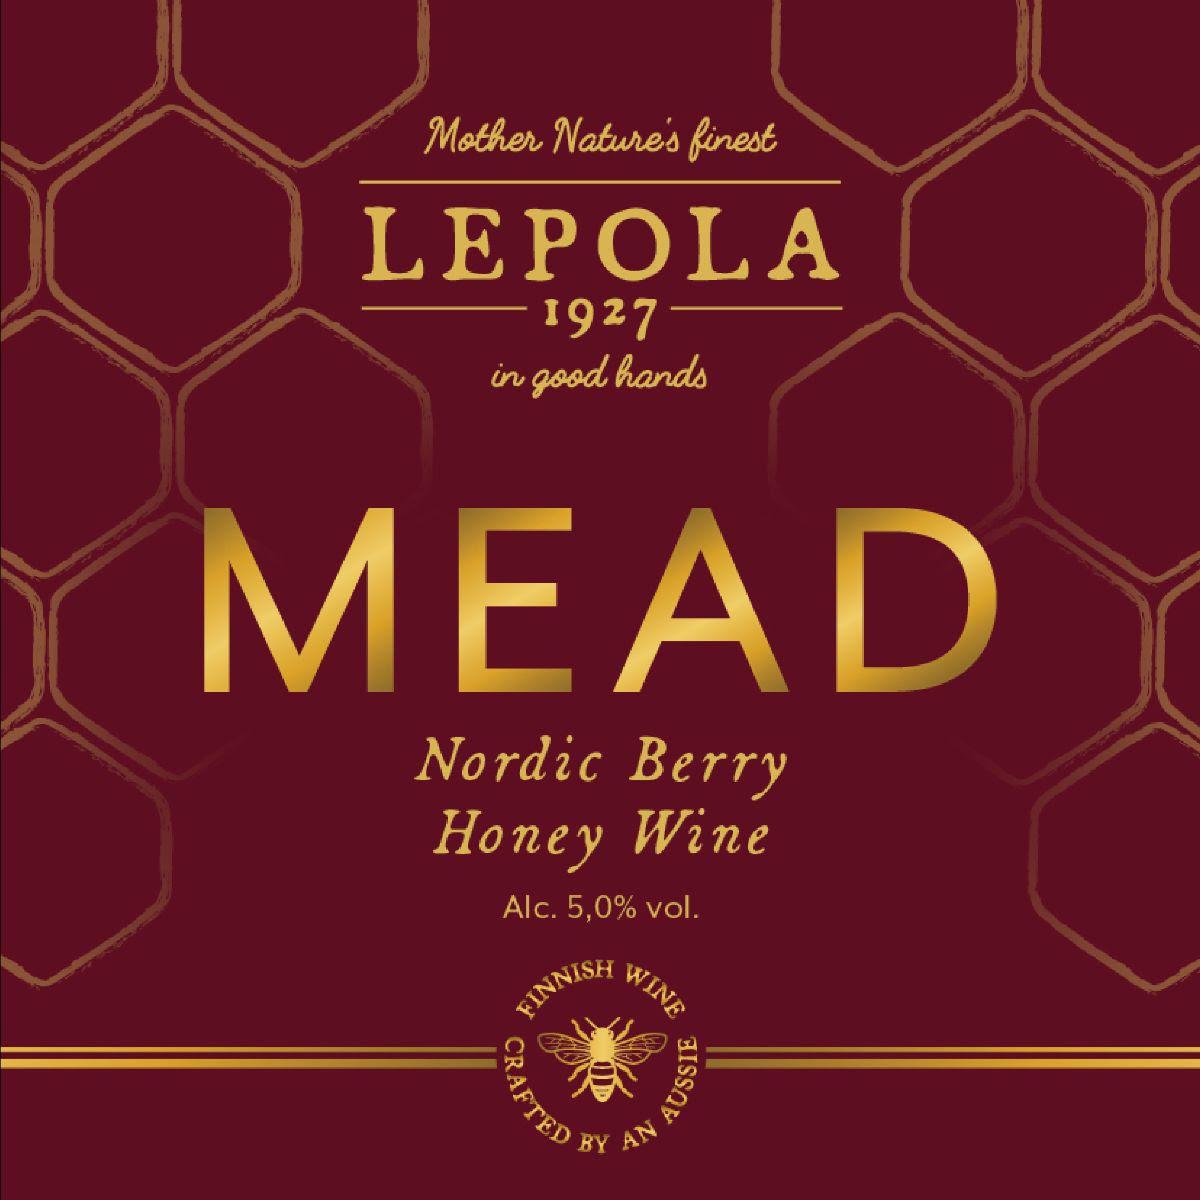 Lepola Nordic Berry Mead 5,0% - 0,33l bottle